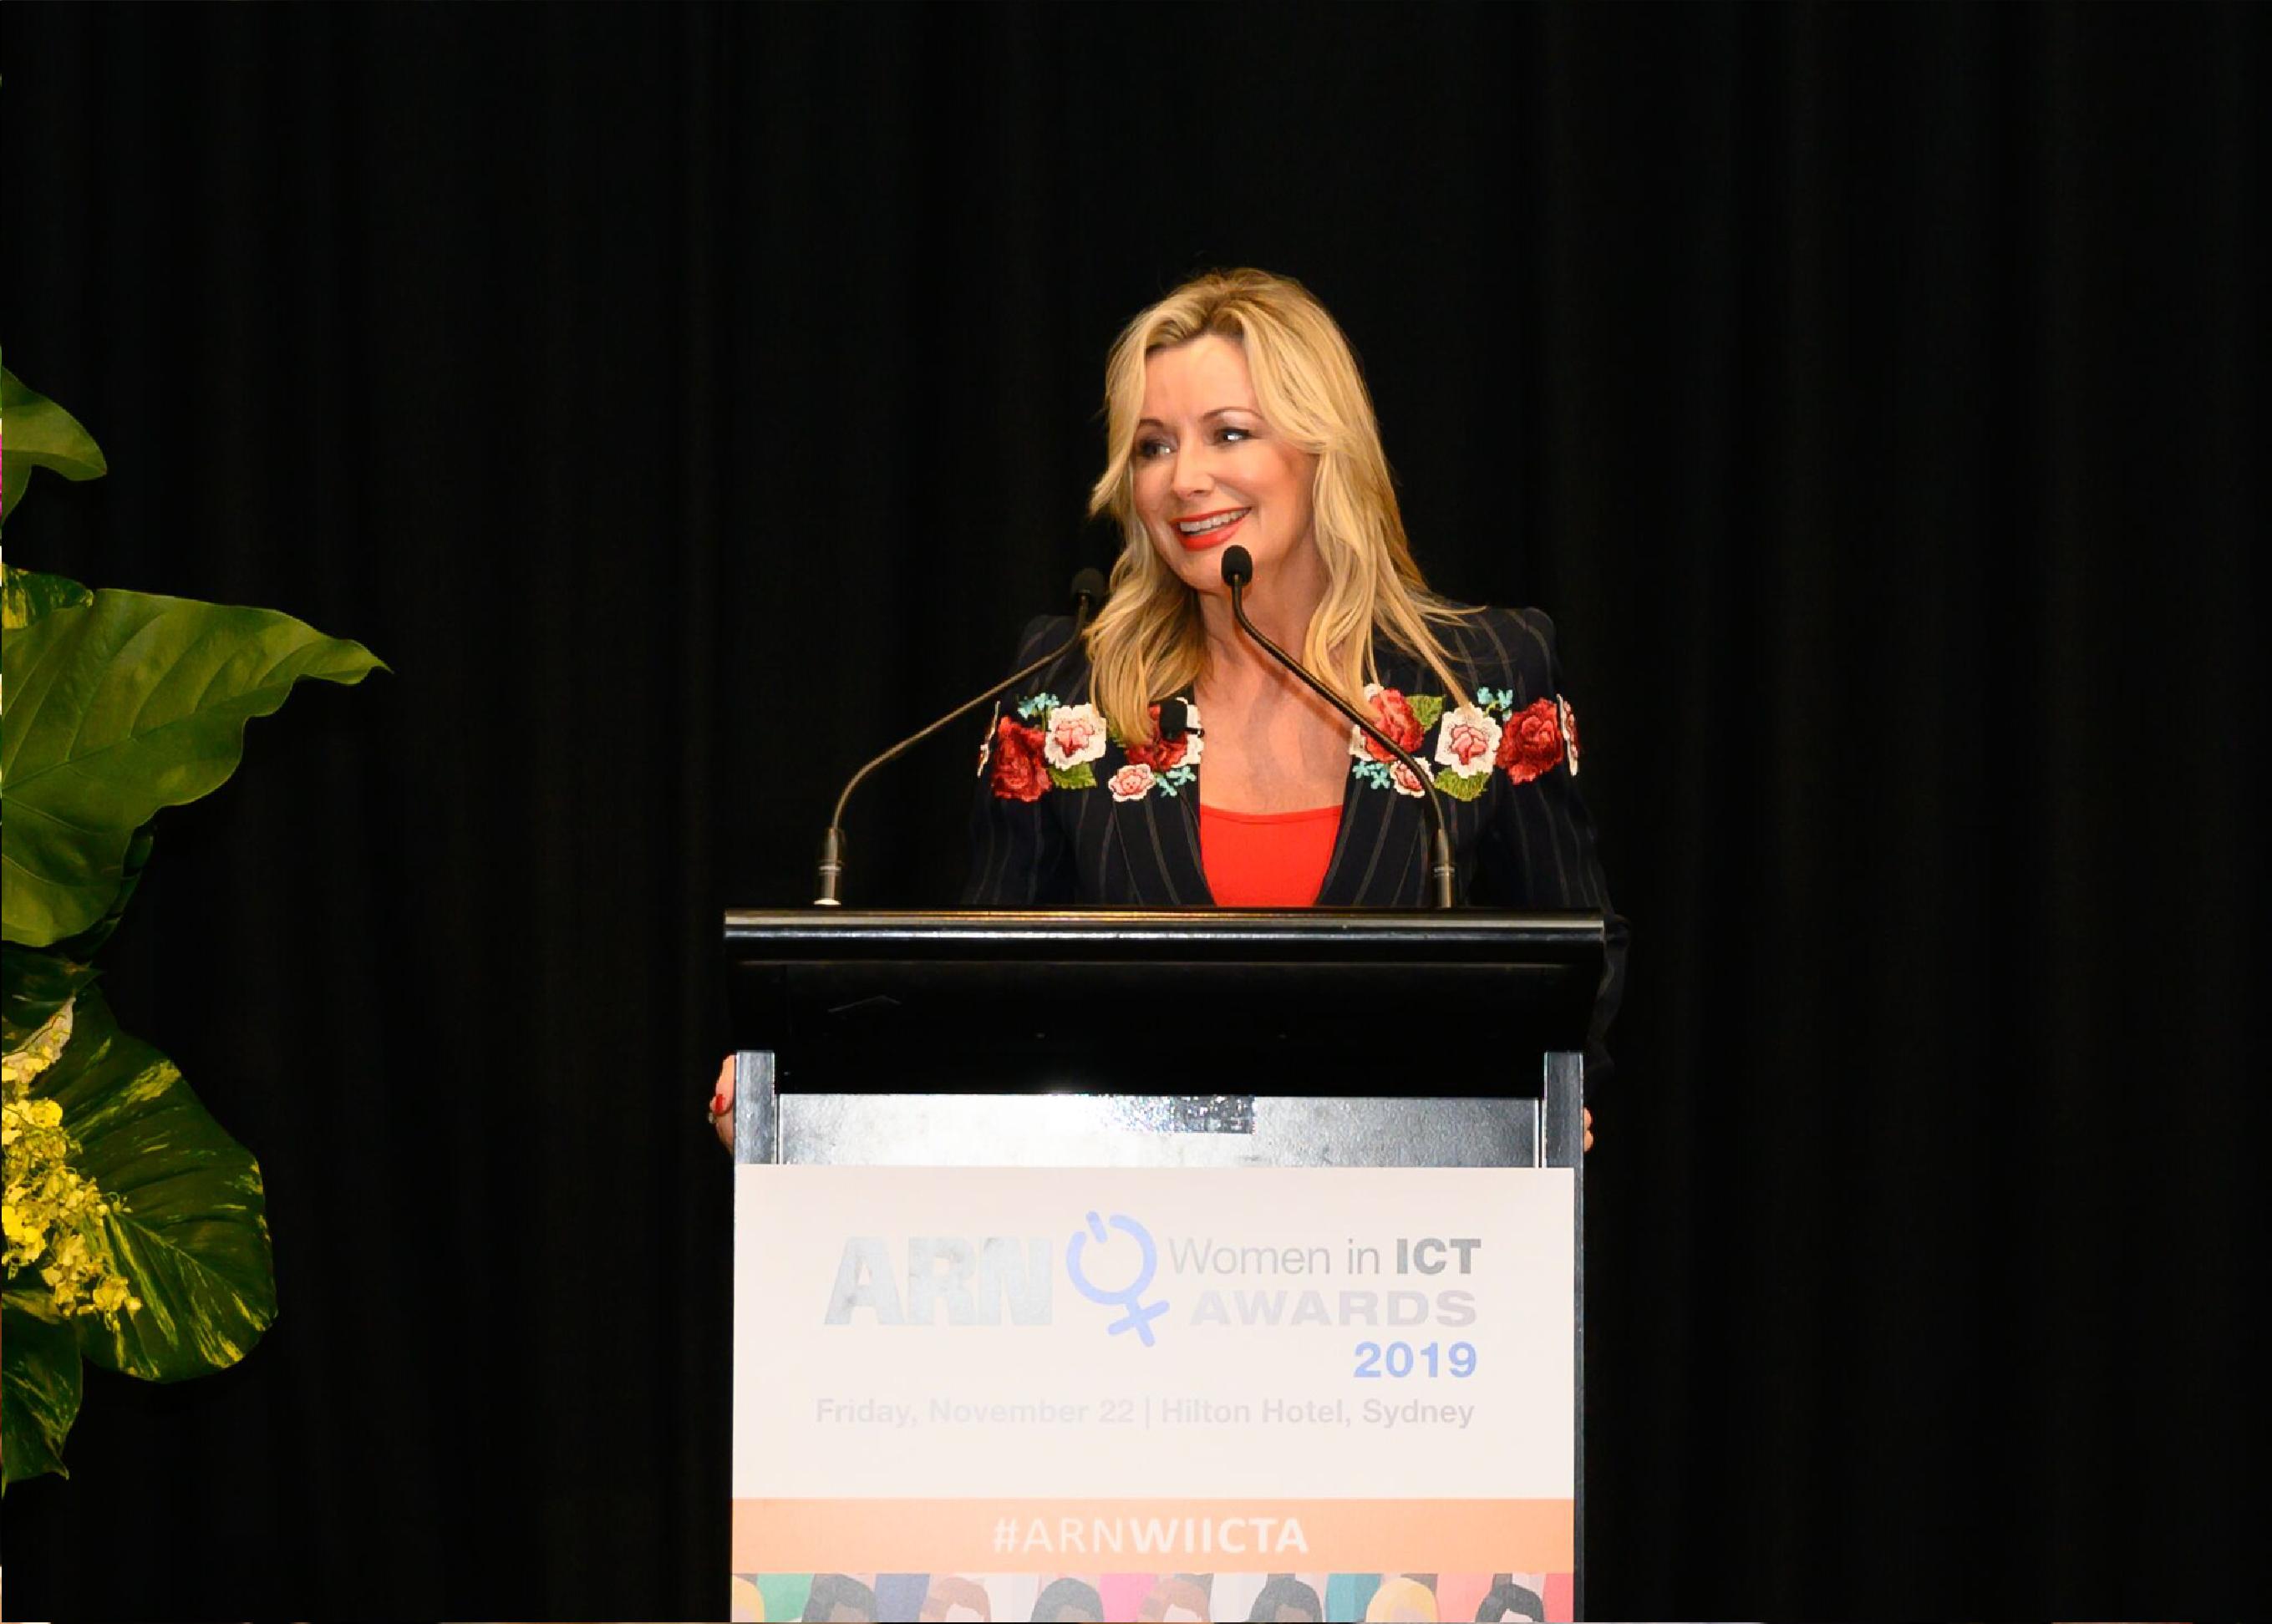 Sharon Williams speaking at ARN women in ICT awards 2019